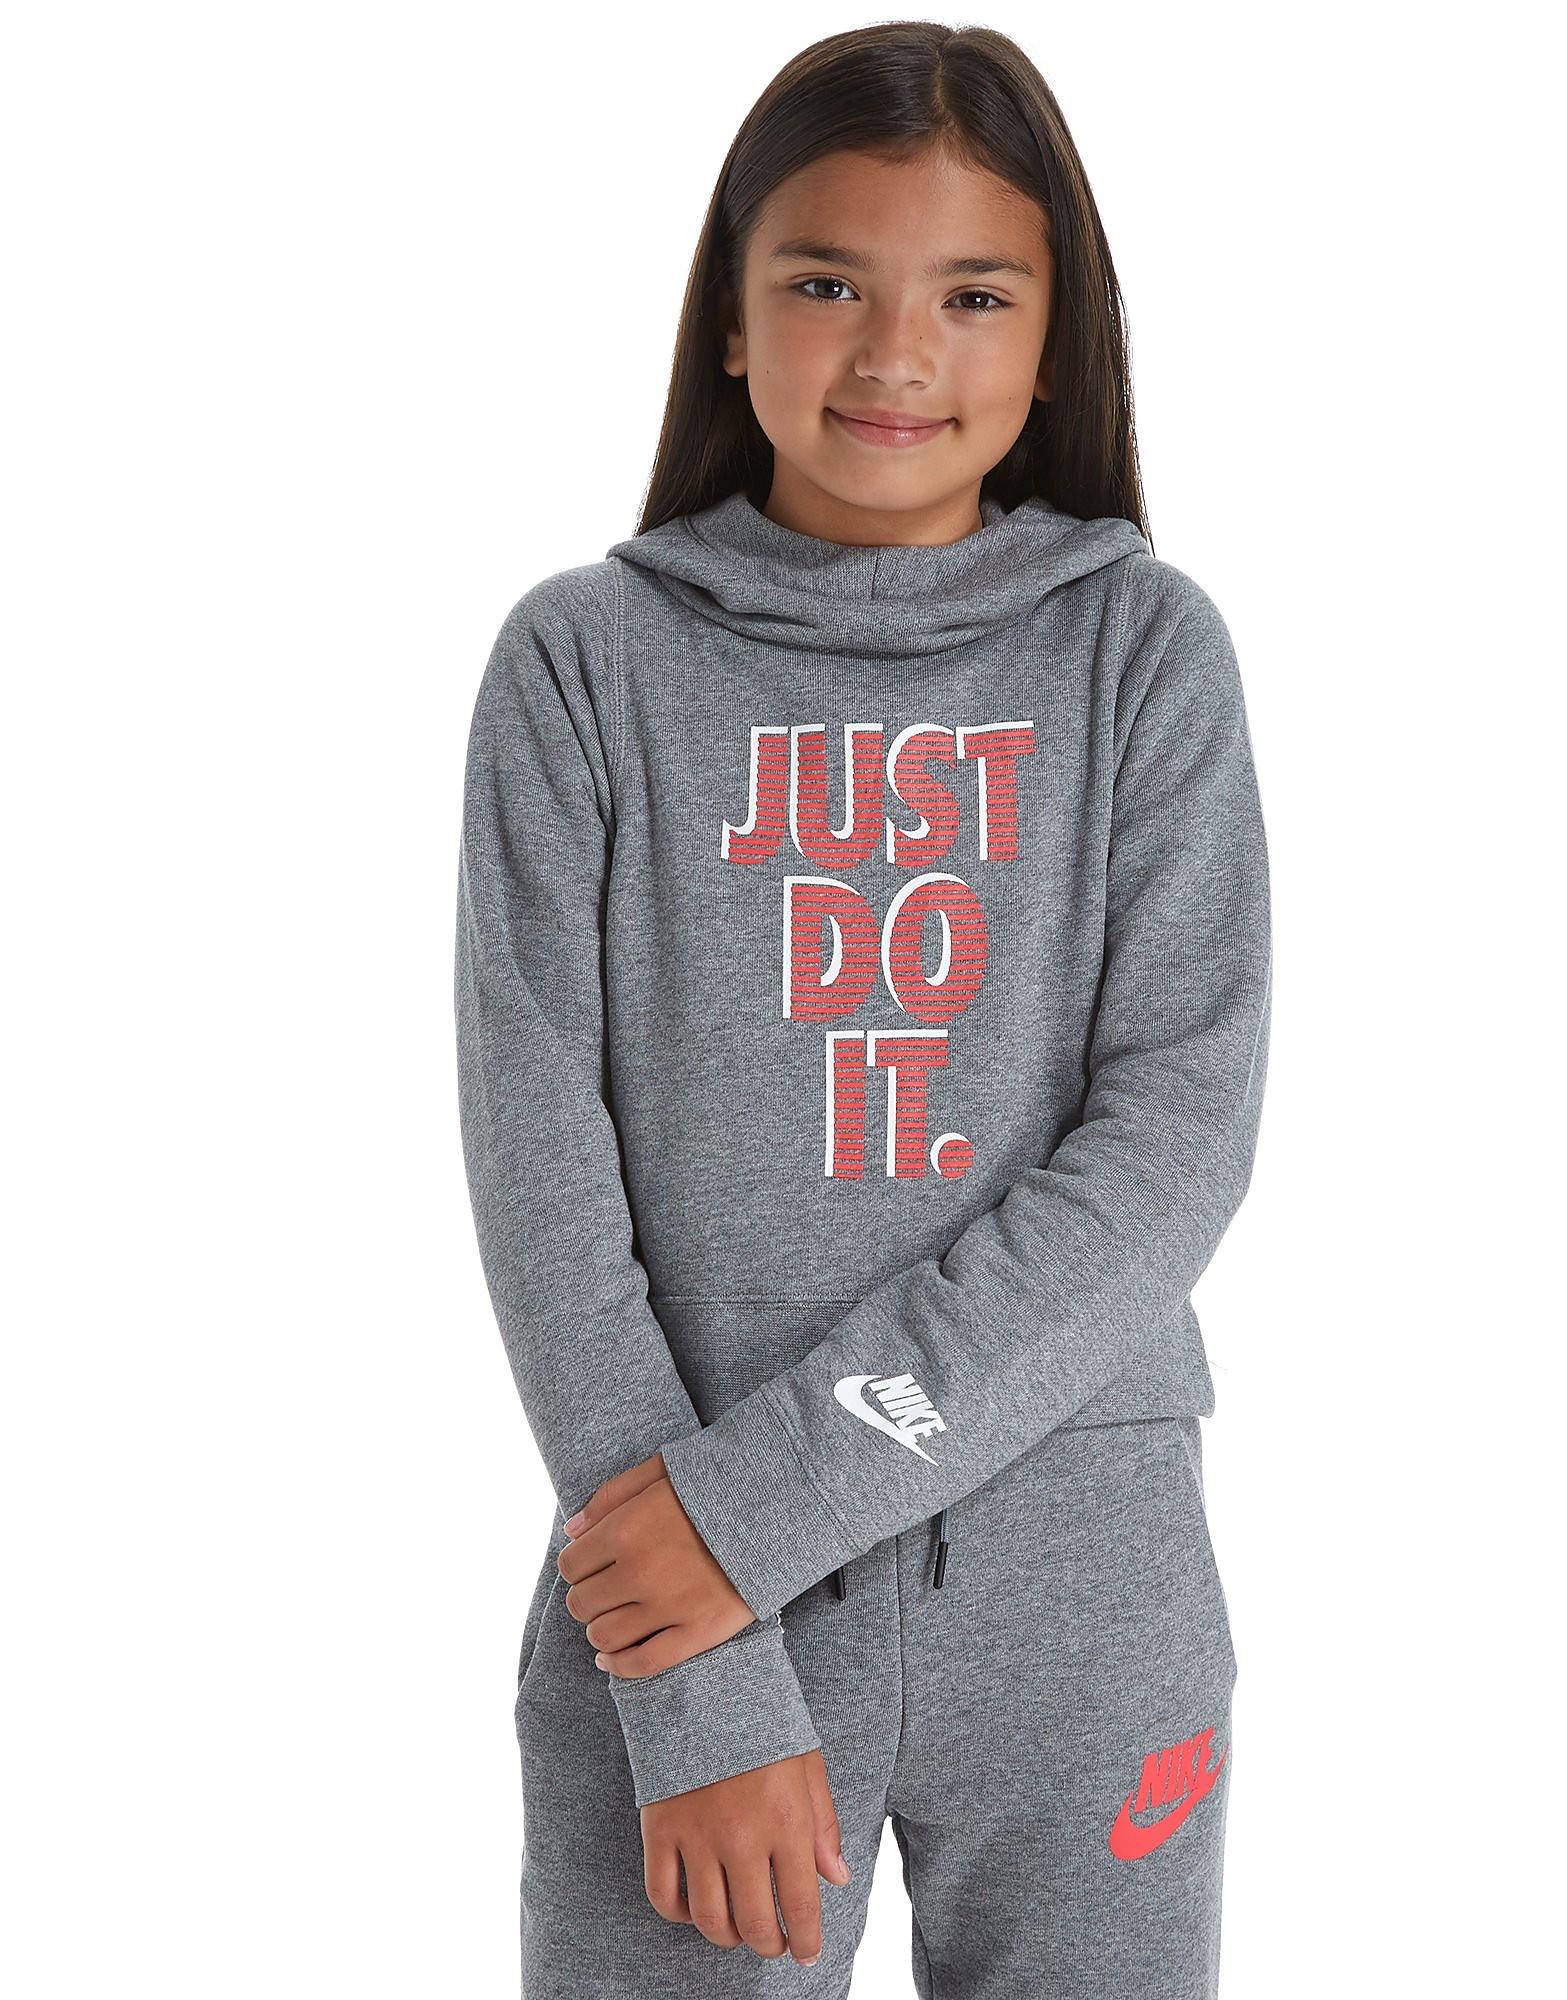 Nike Just Do It Cropped Hoody Girls